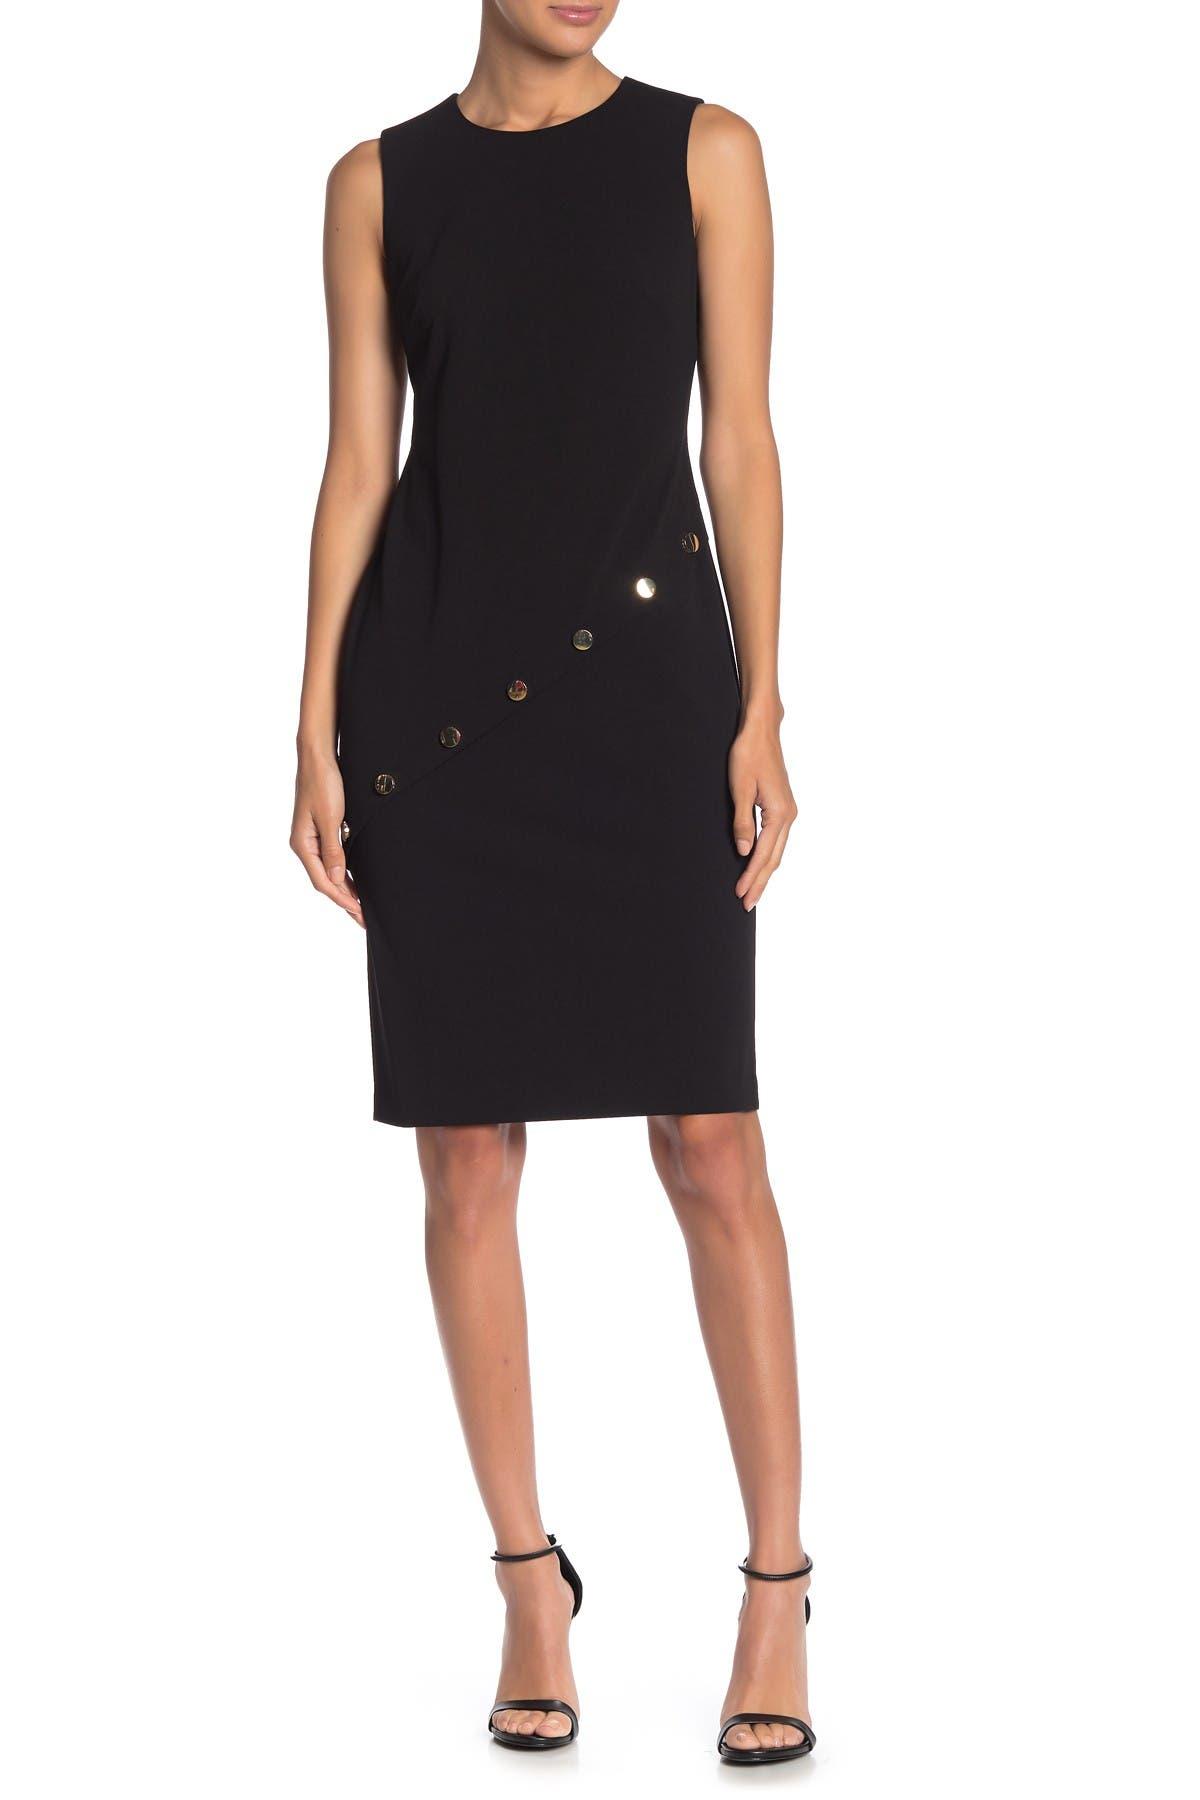 Image of ZNDU Modern American Designer Diagonal Button Sheath Dress